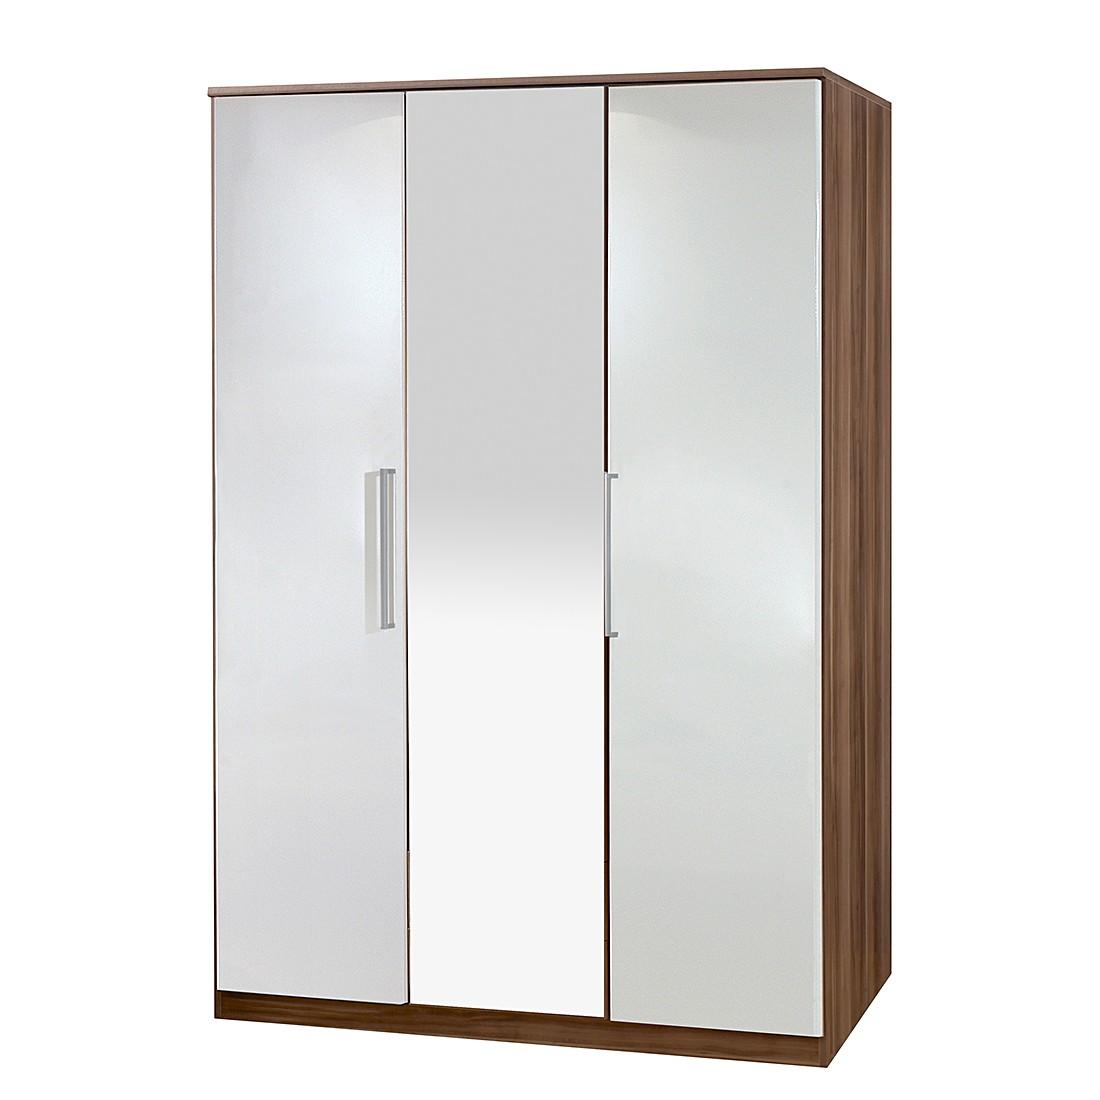 Shopping portail free for Miroir 2 metres